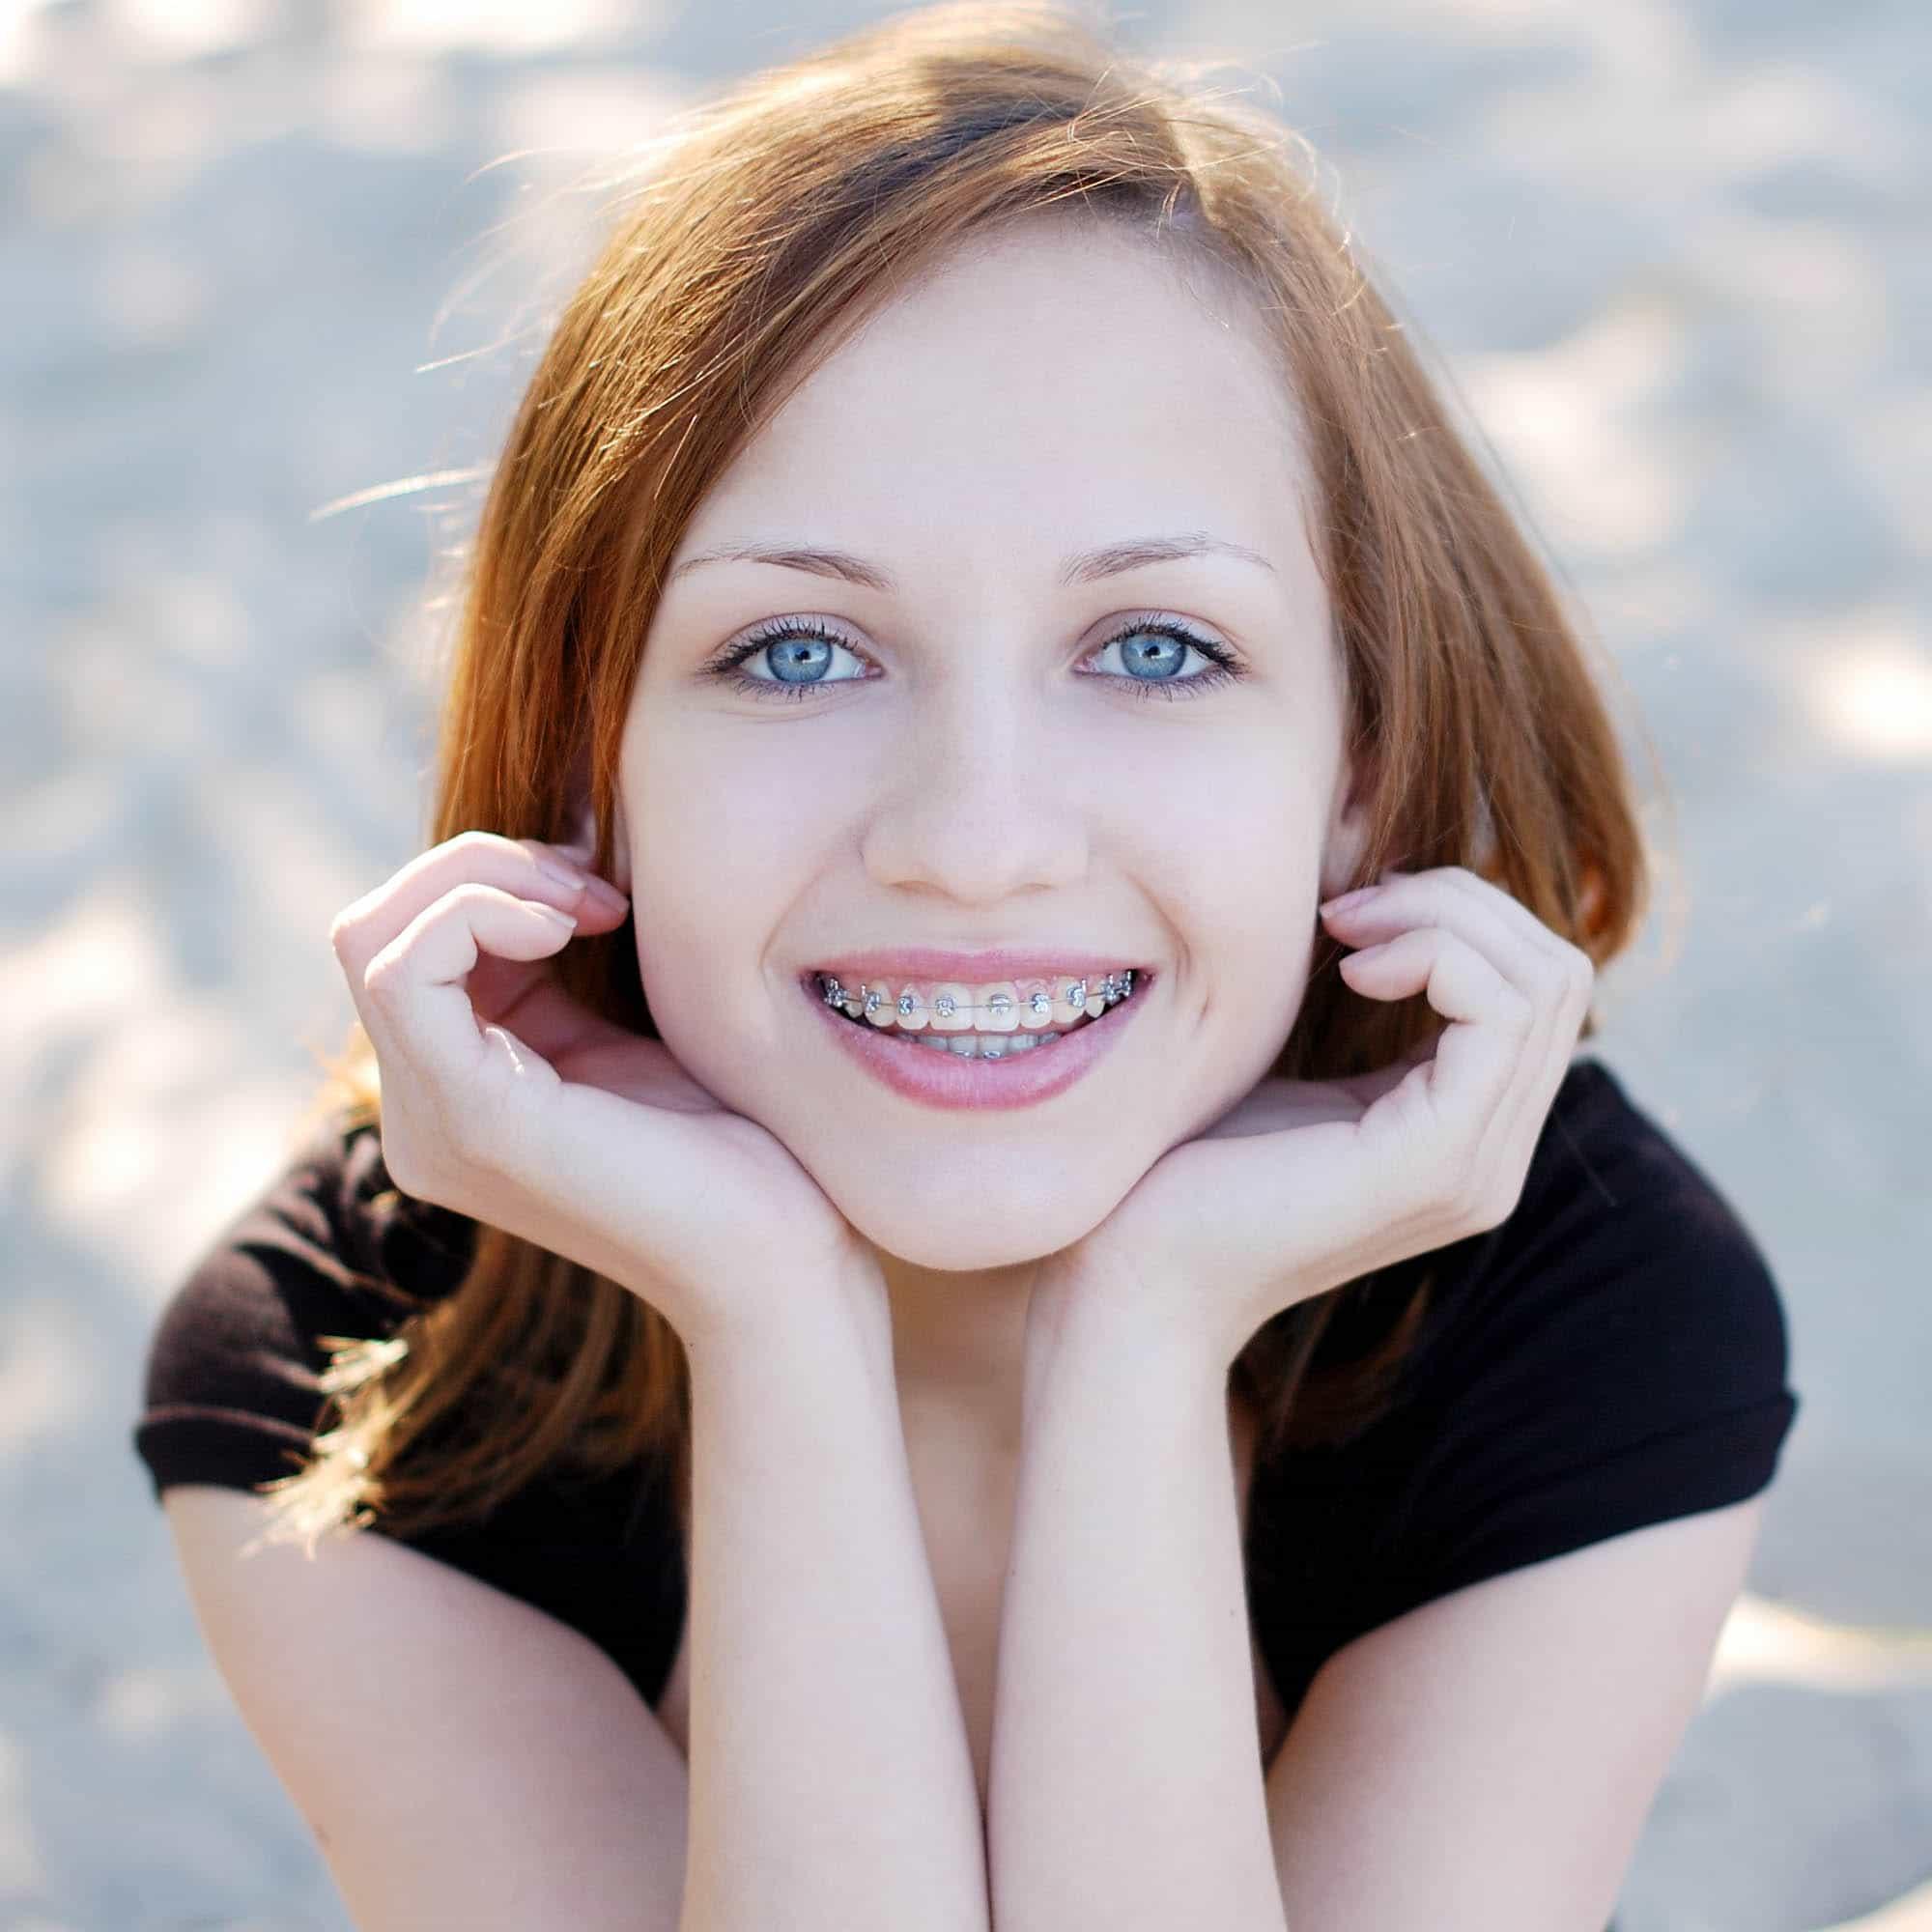 Atlanta social skills, group and individual therapy for teens and adolescents